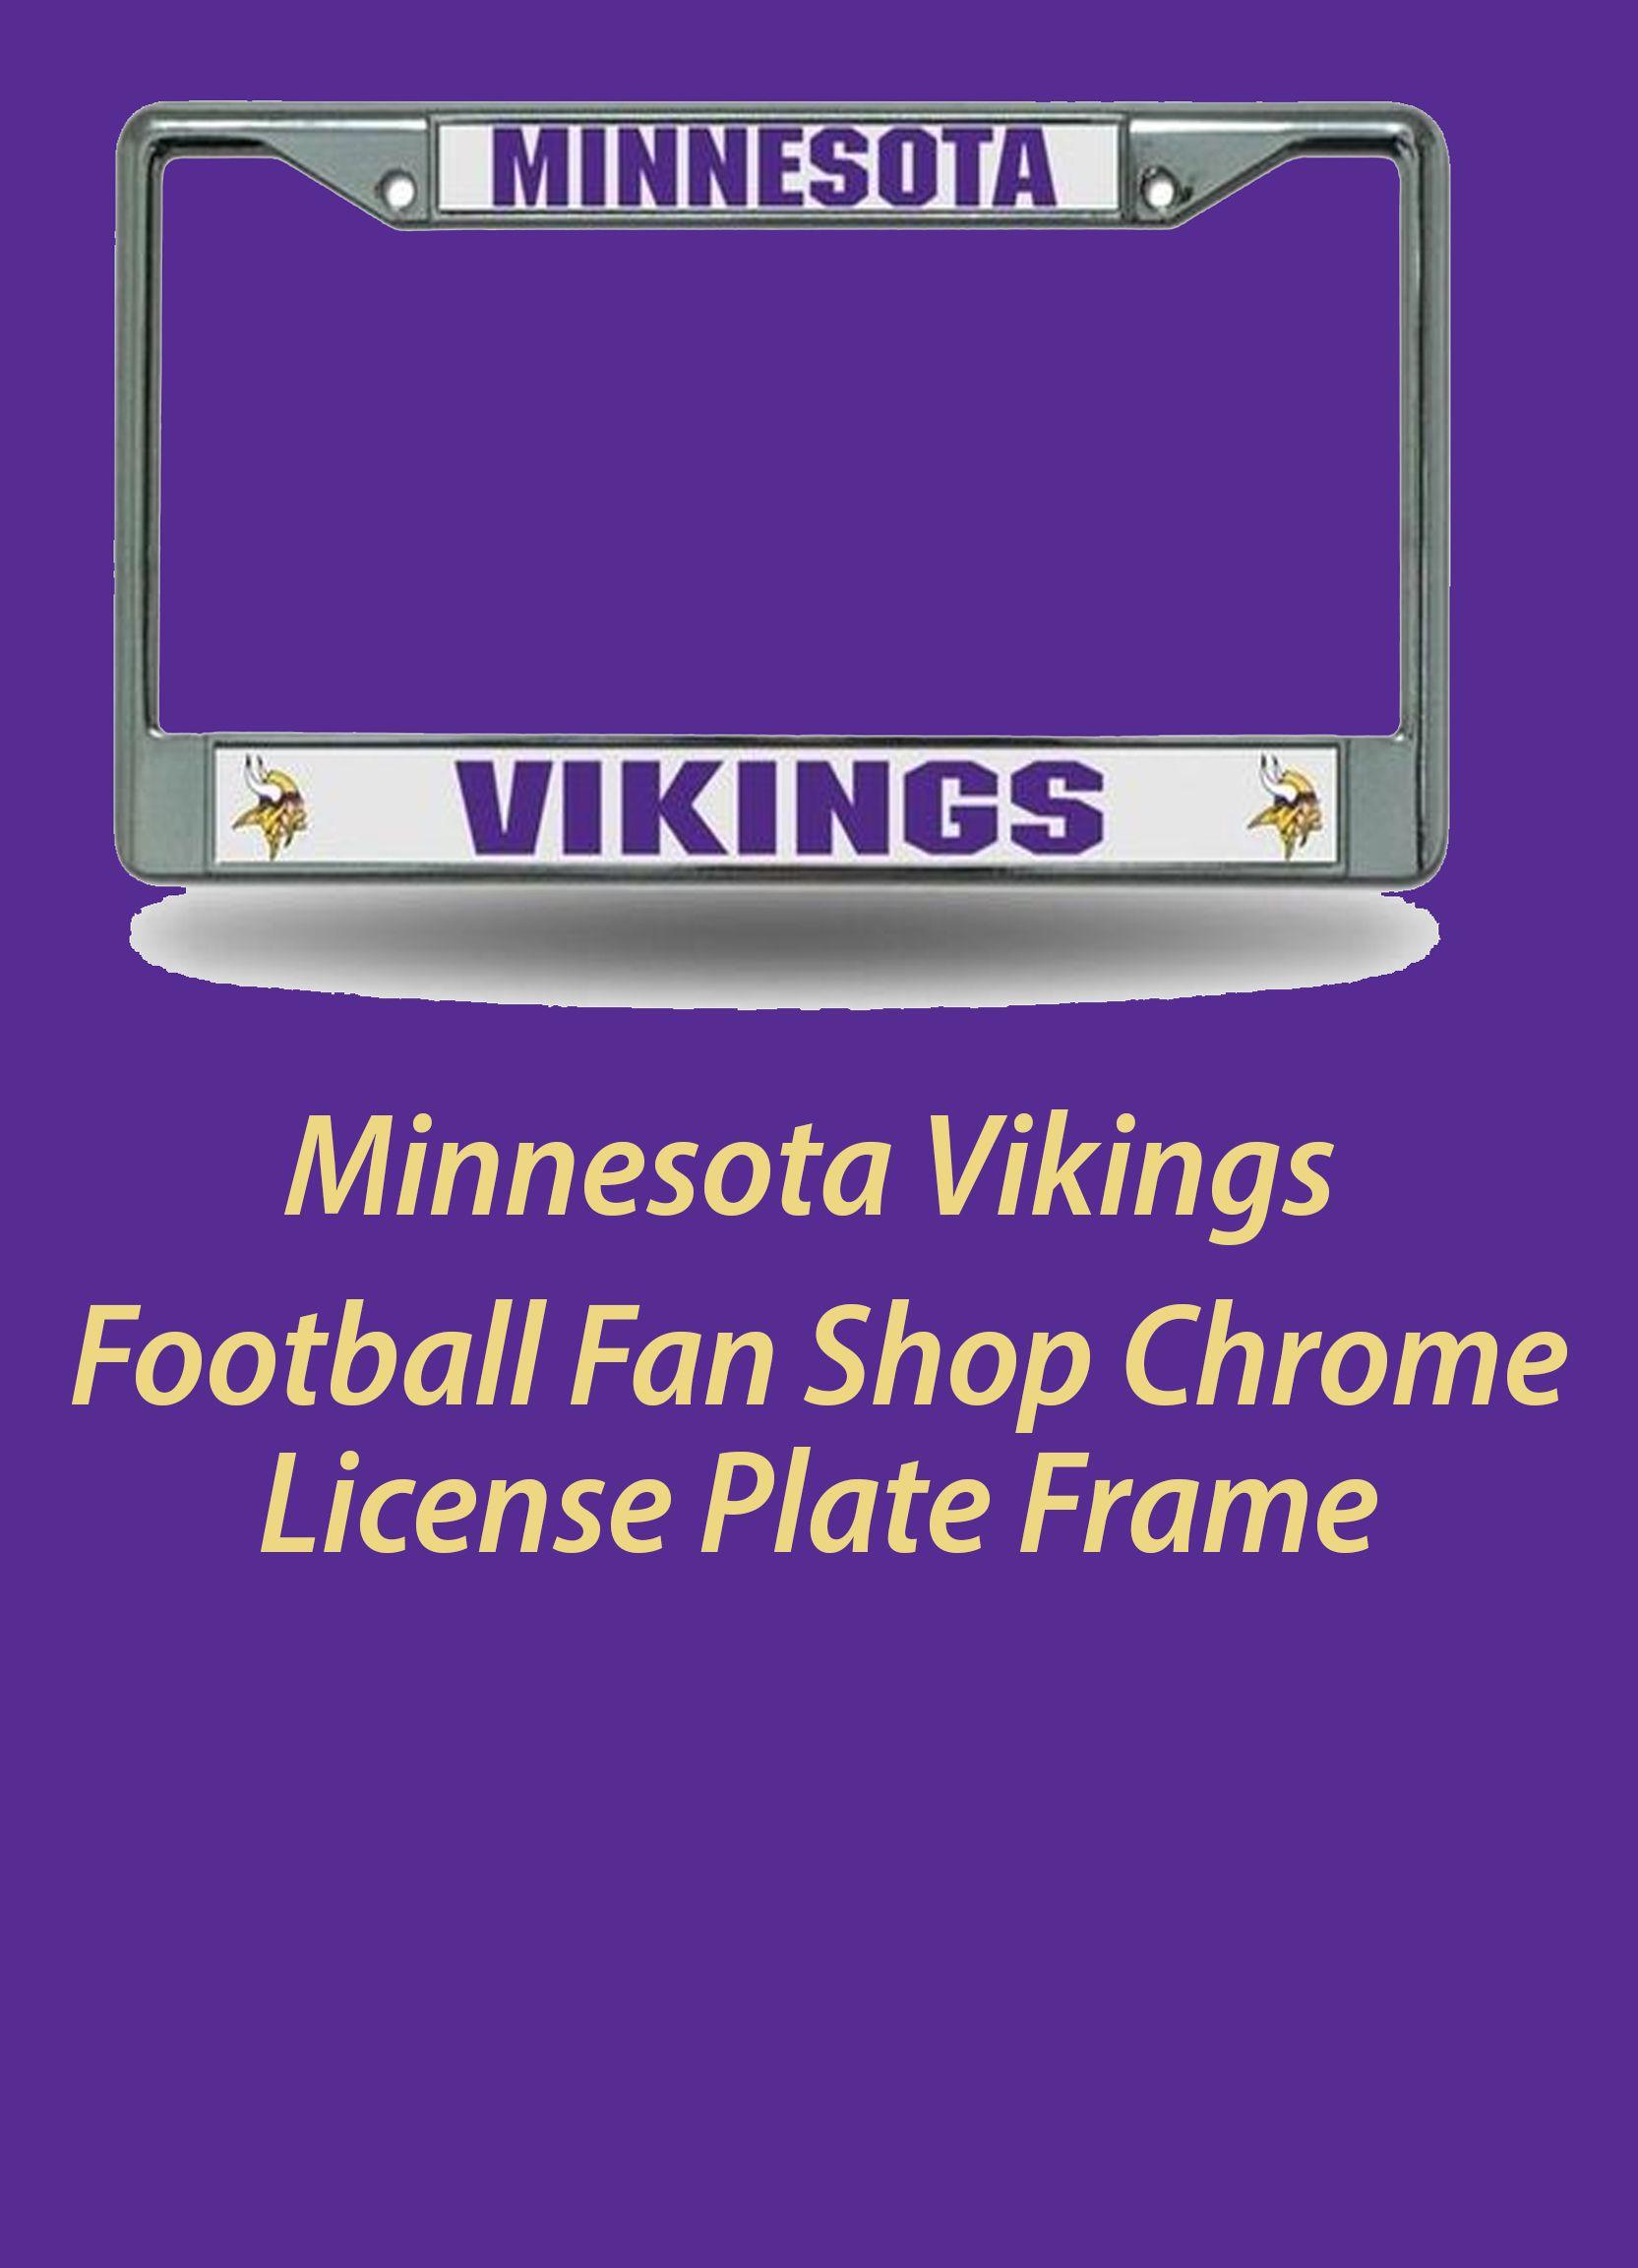 Football Fan Shop Chrome License Plate Frame Minnesota Vikings Ad